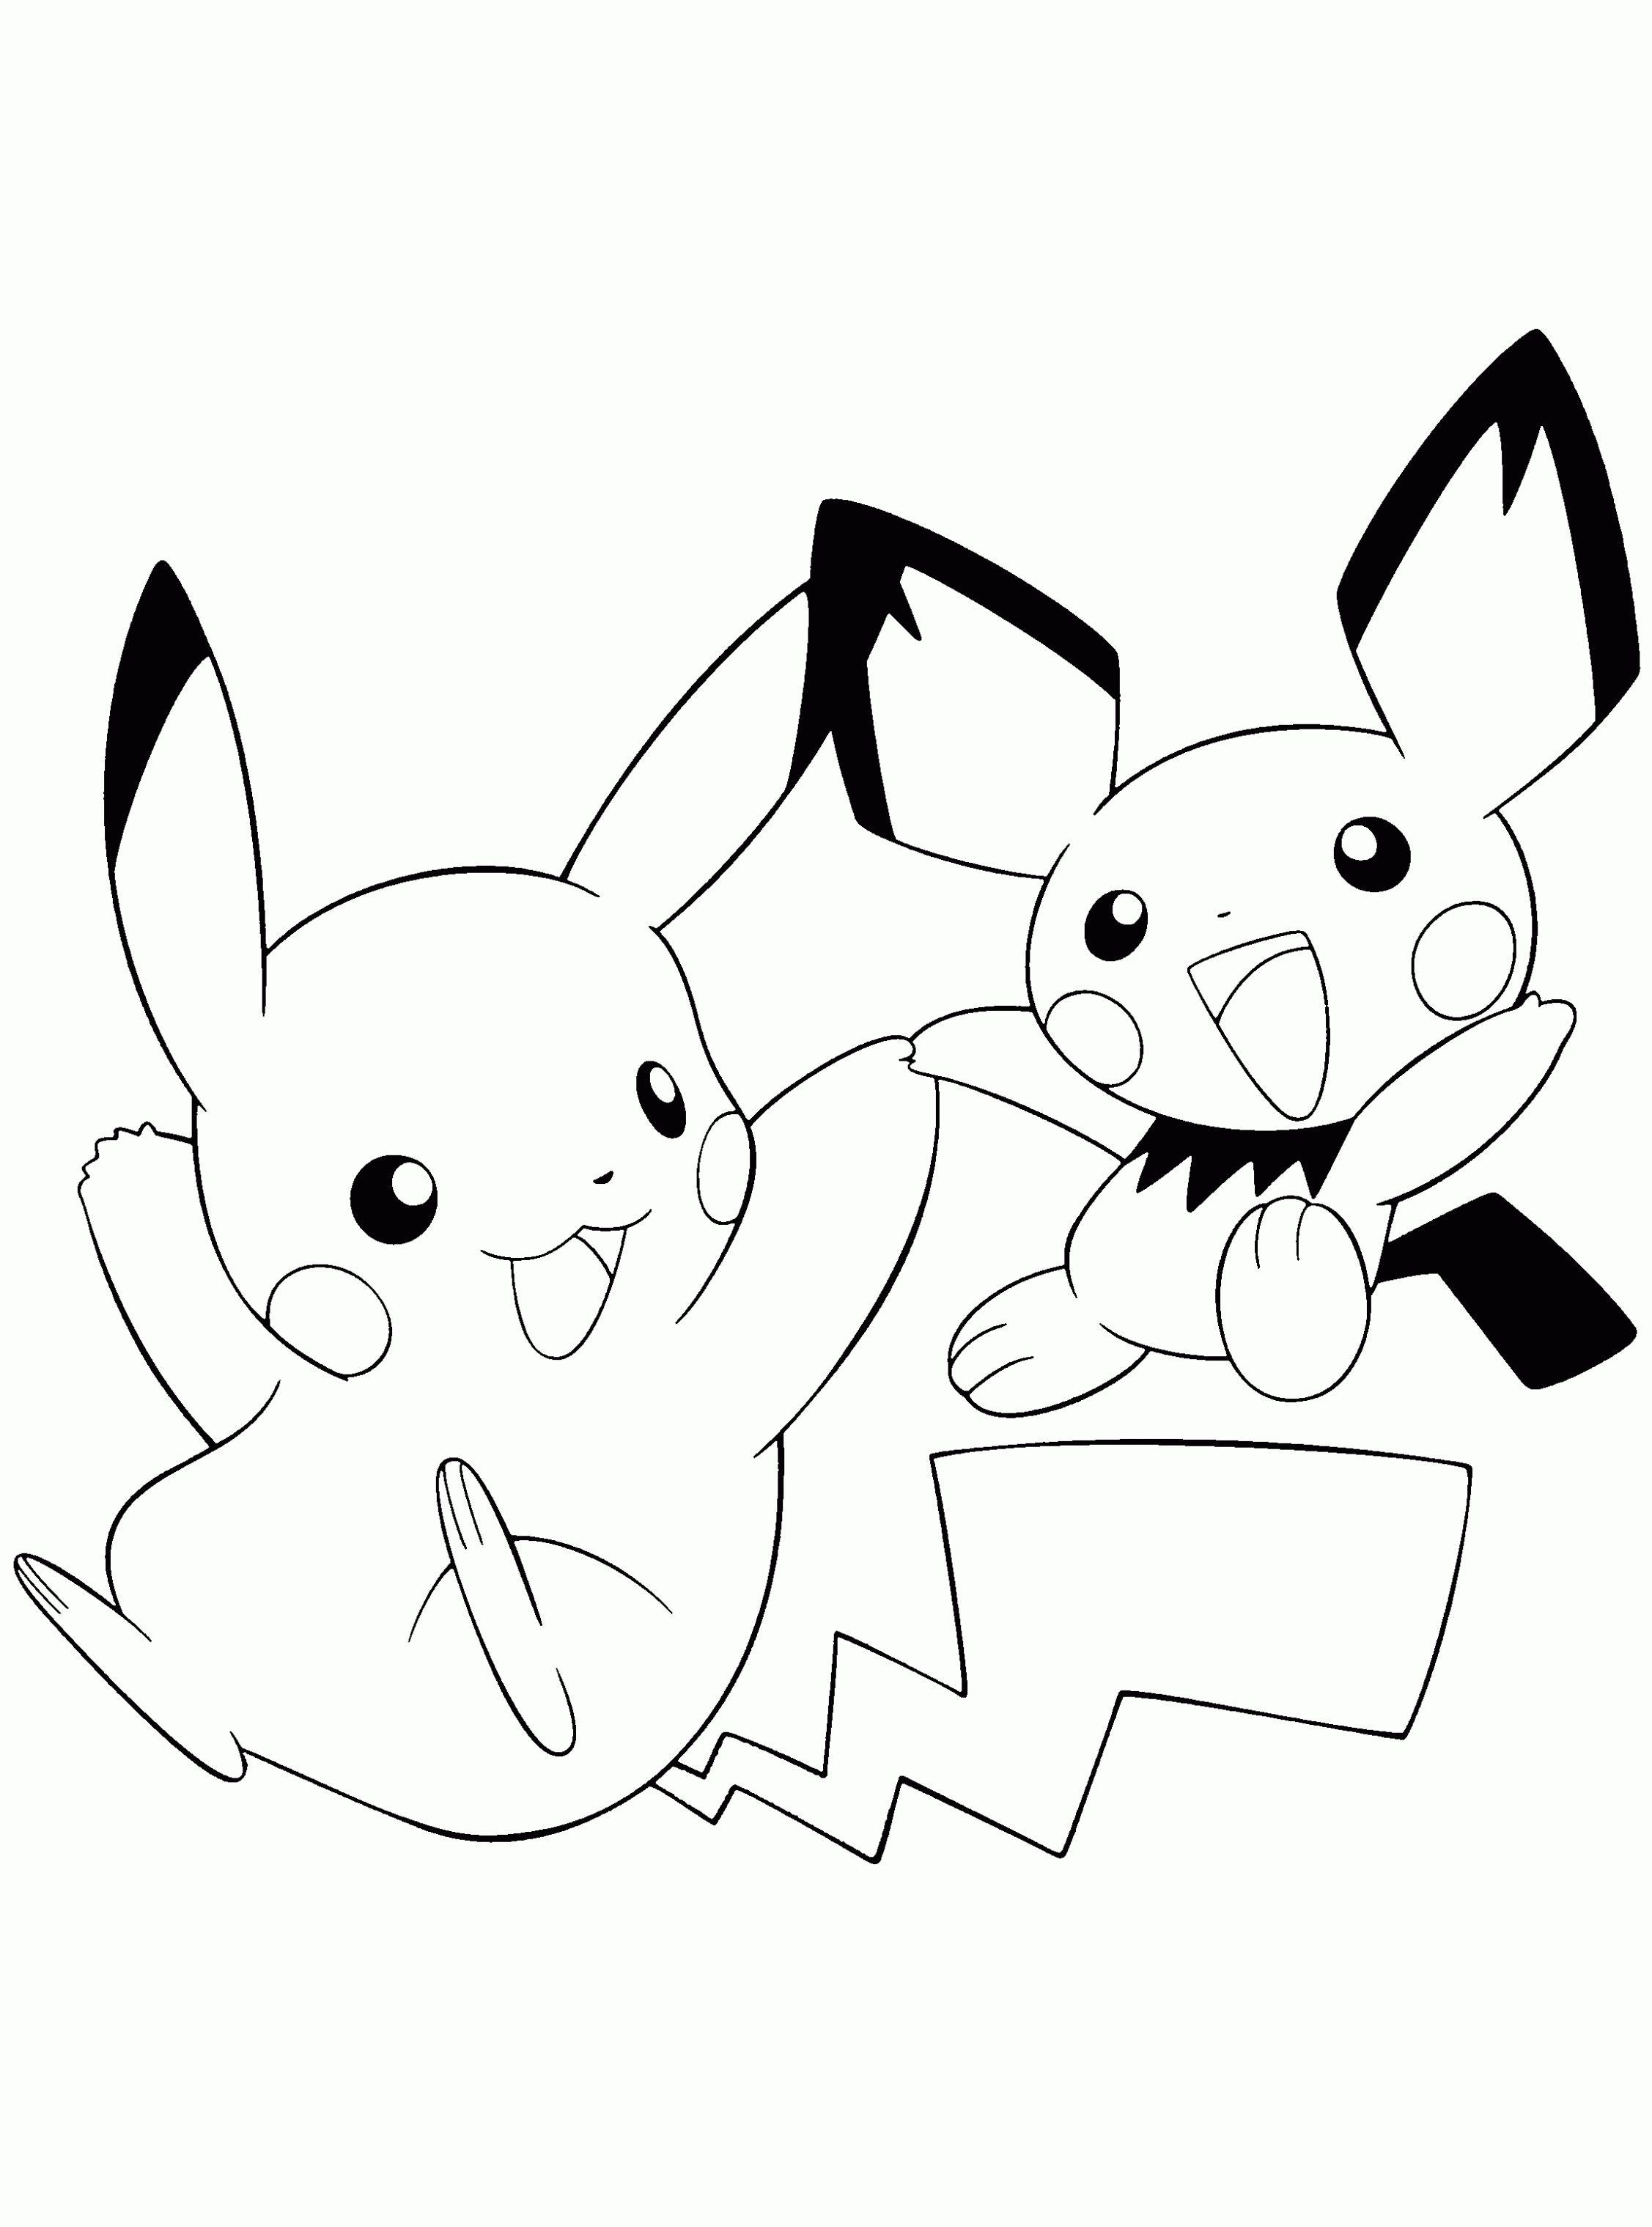 fotos de pokemons para dibujar » Full HD Pictures [4K Ultra] | Full ...